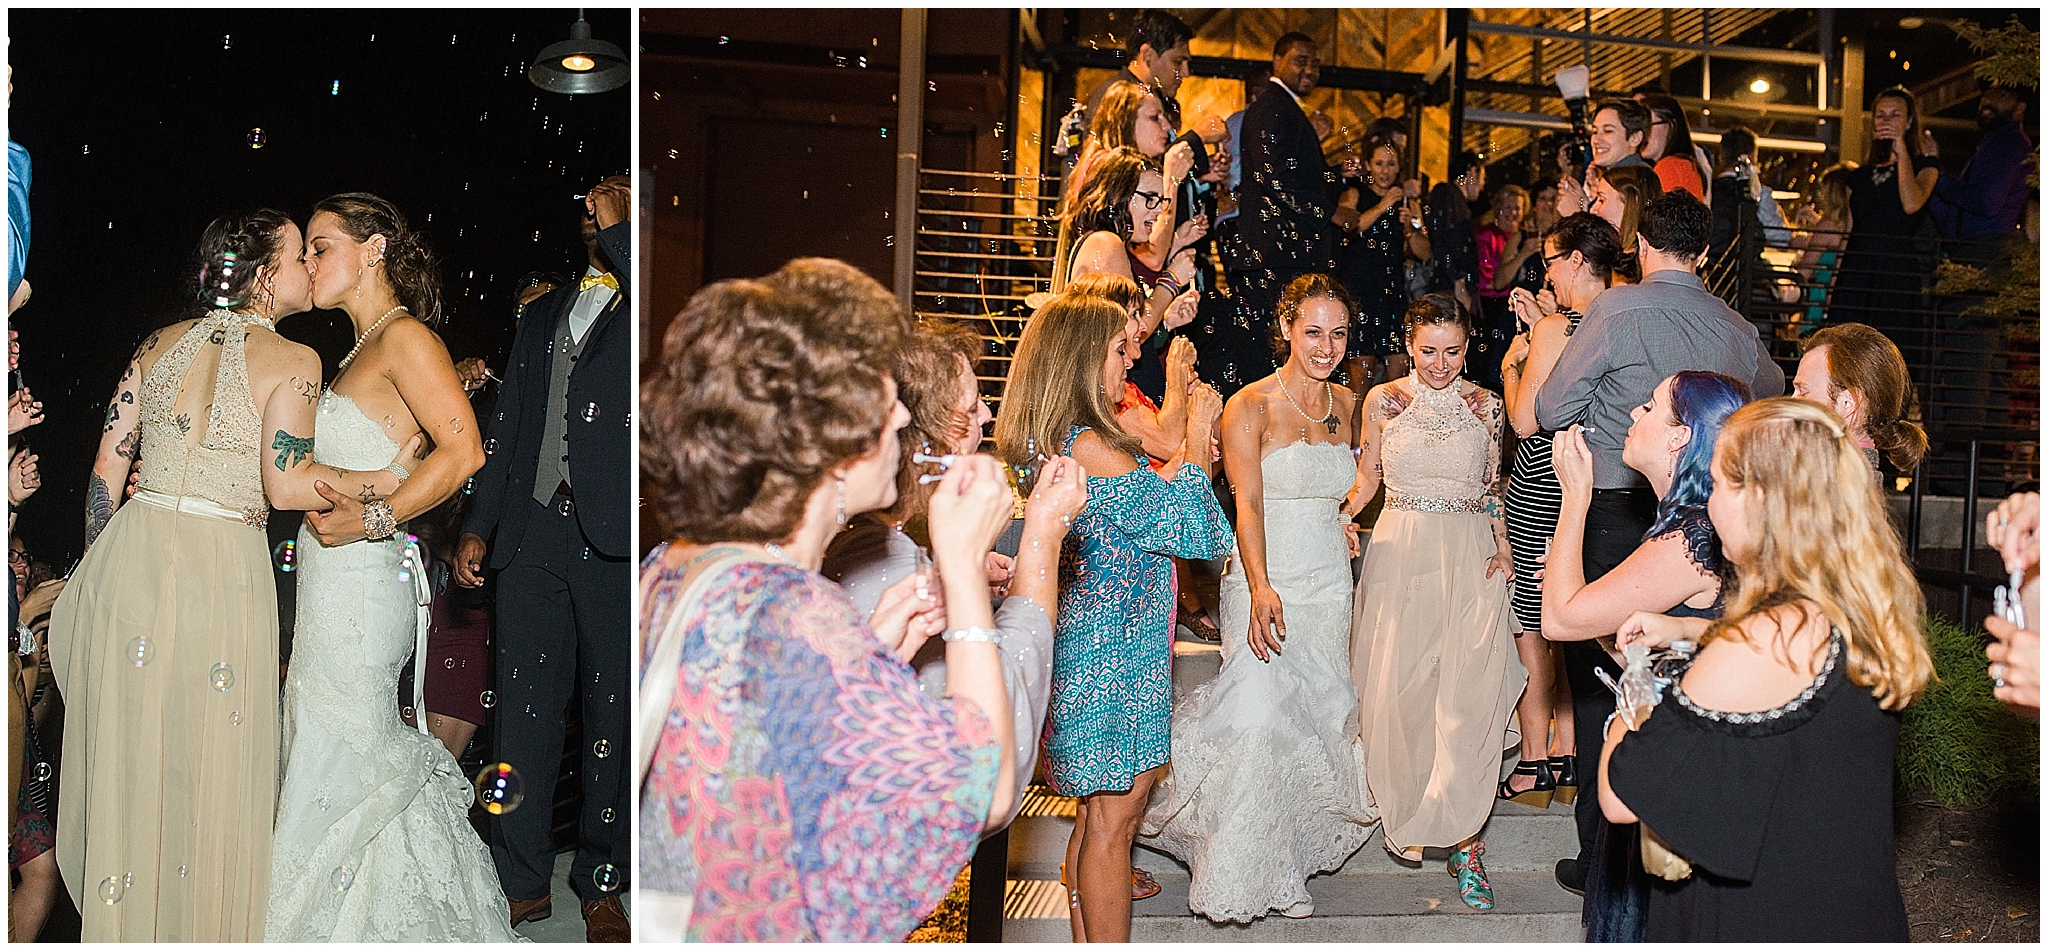 Wedding_Asheville_Highland_Brewing_Photographer_38.jpg